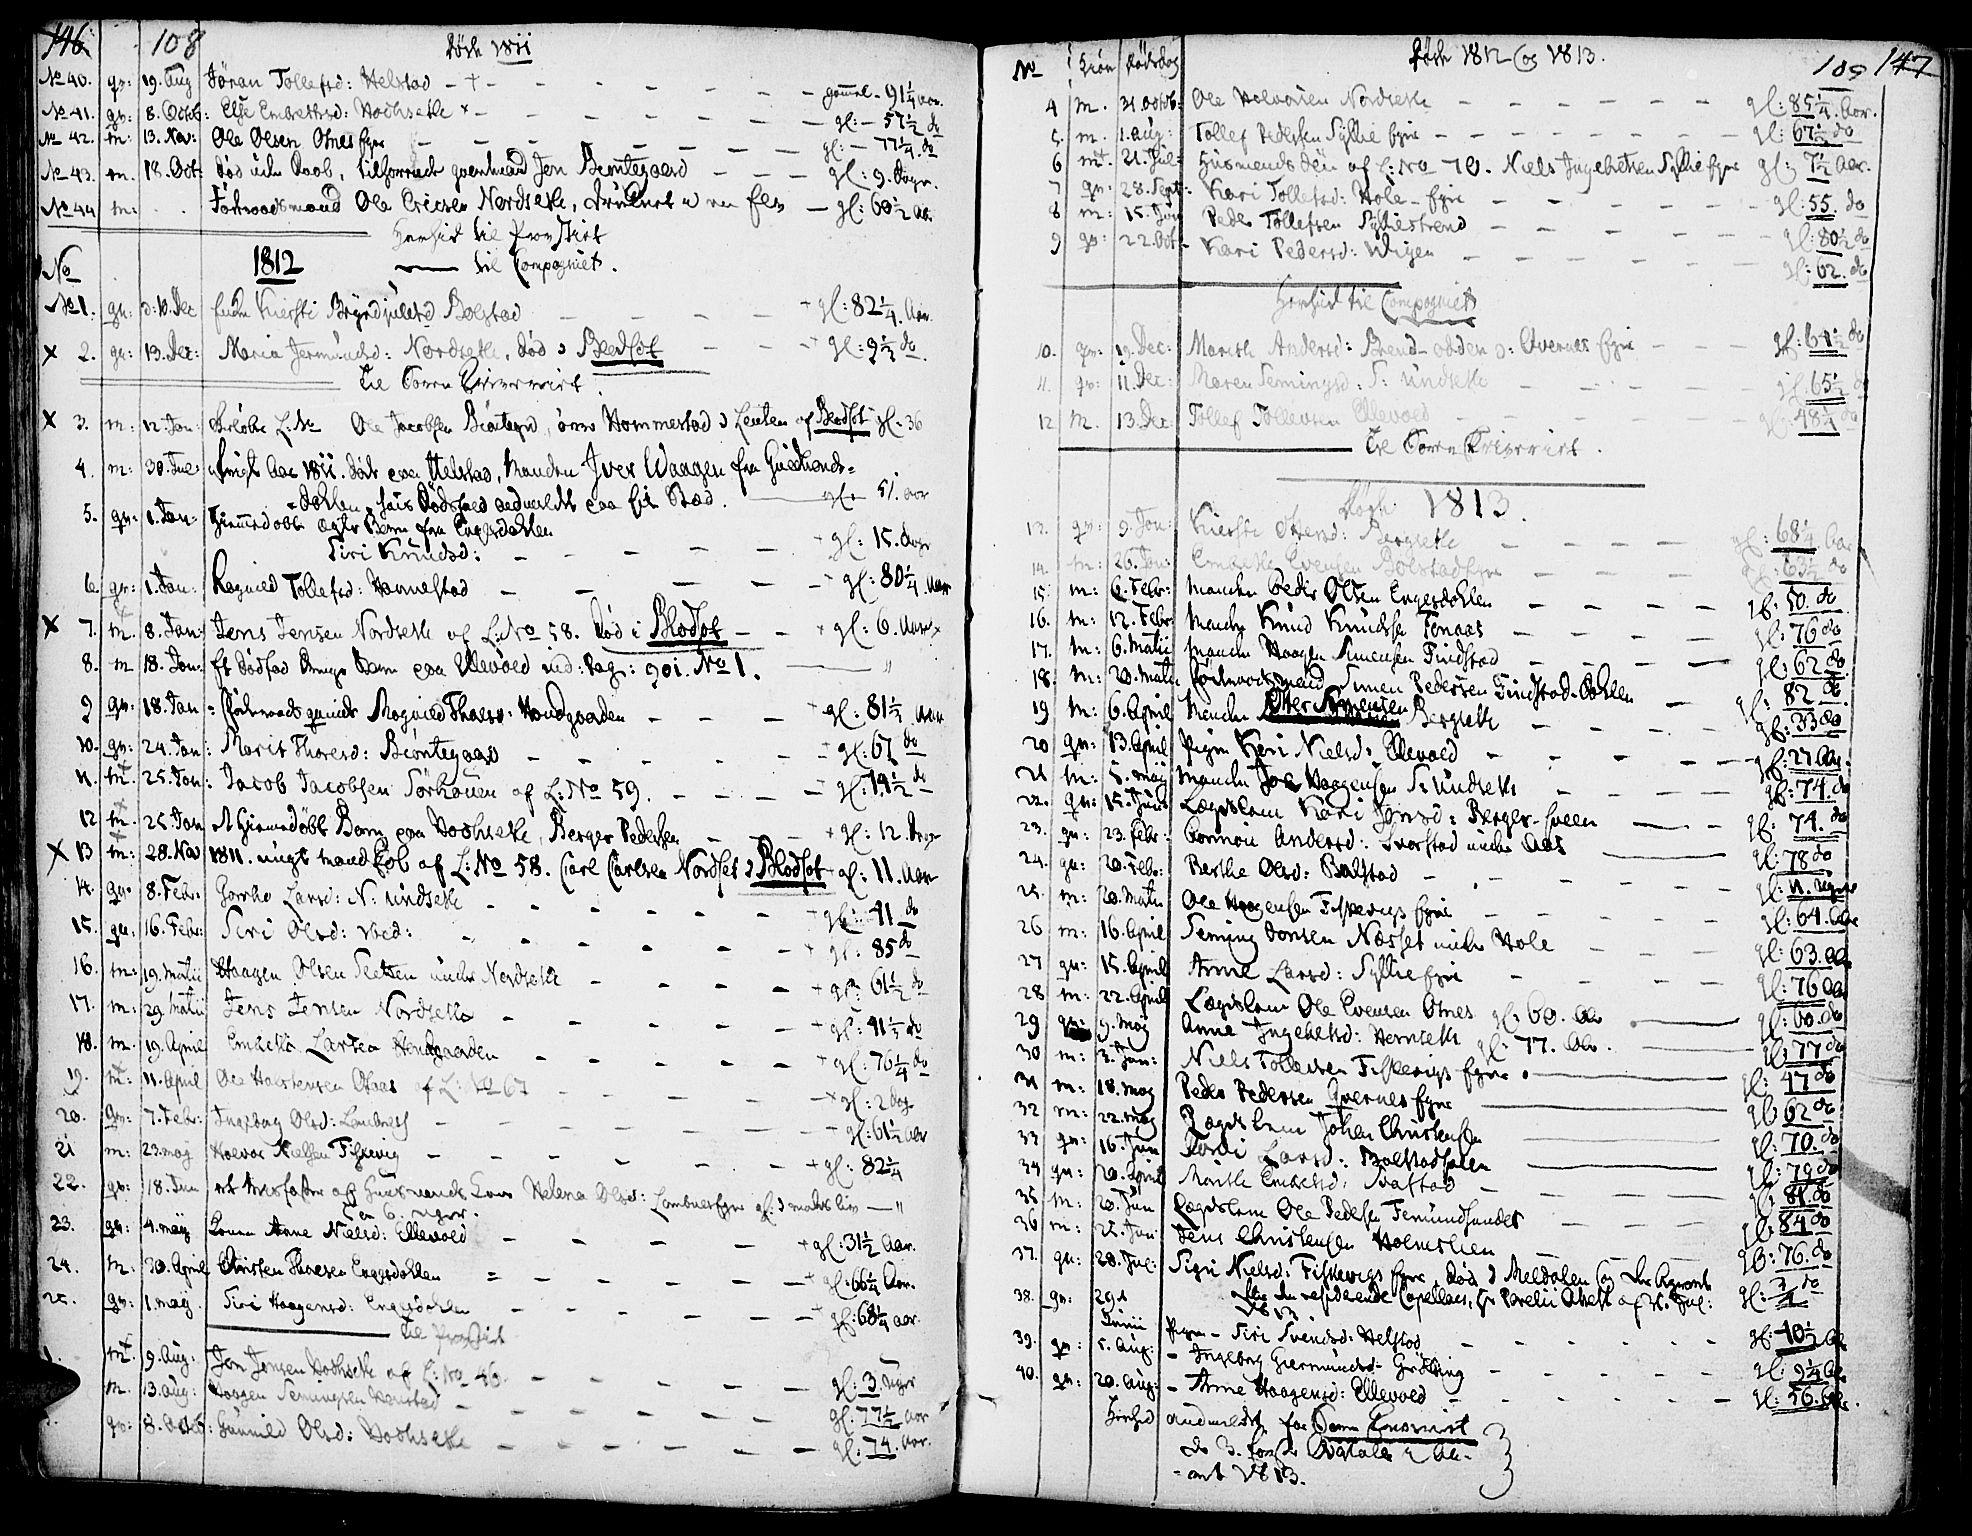 SAH, Rendalen prestekontor, H/Ha/Haa/L0002: Ministerialbok nr. 2, 1788-1814, s. 108-109